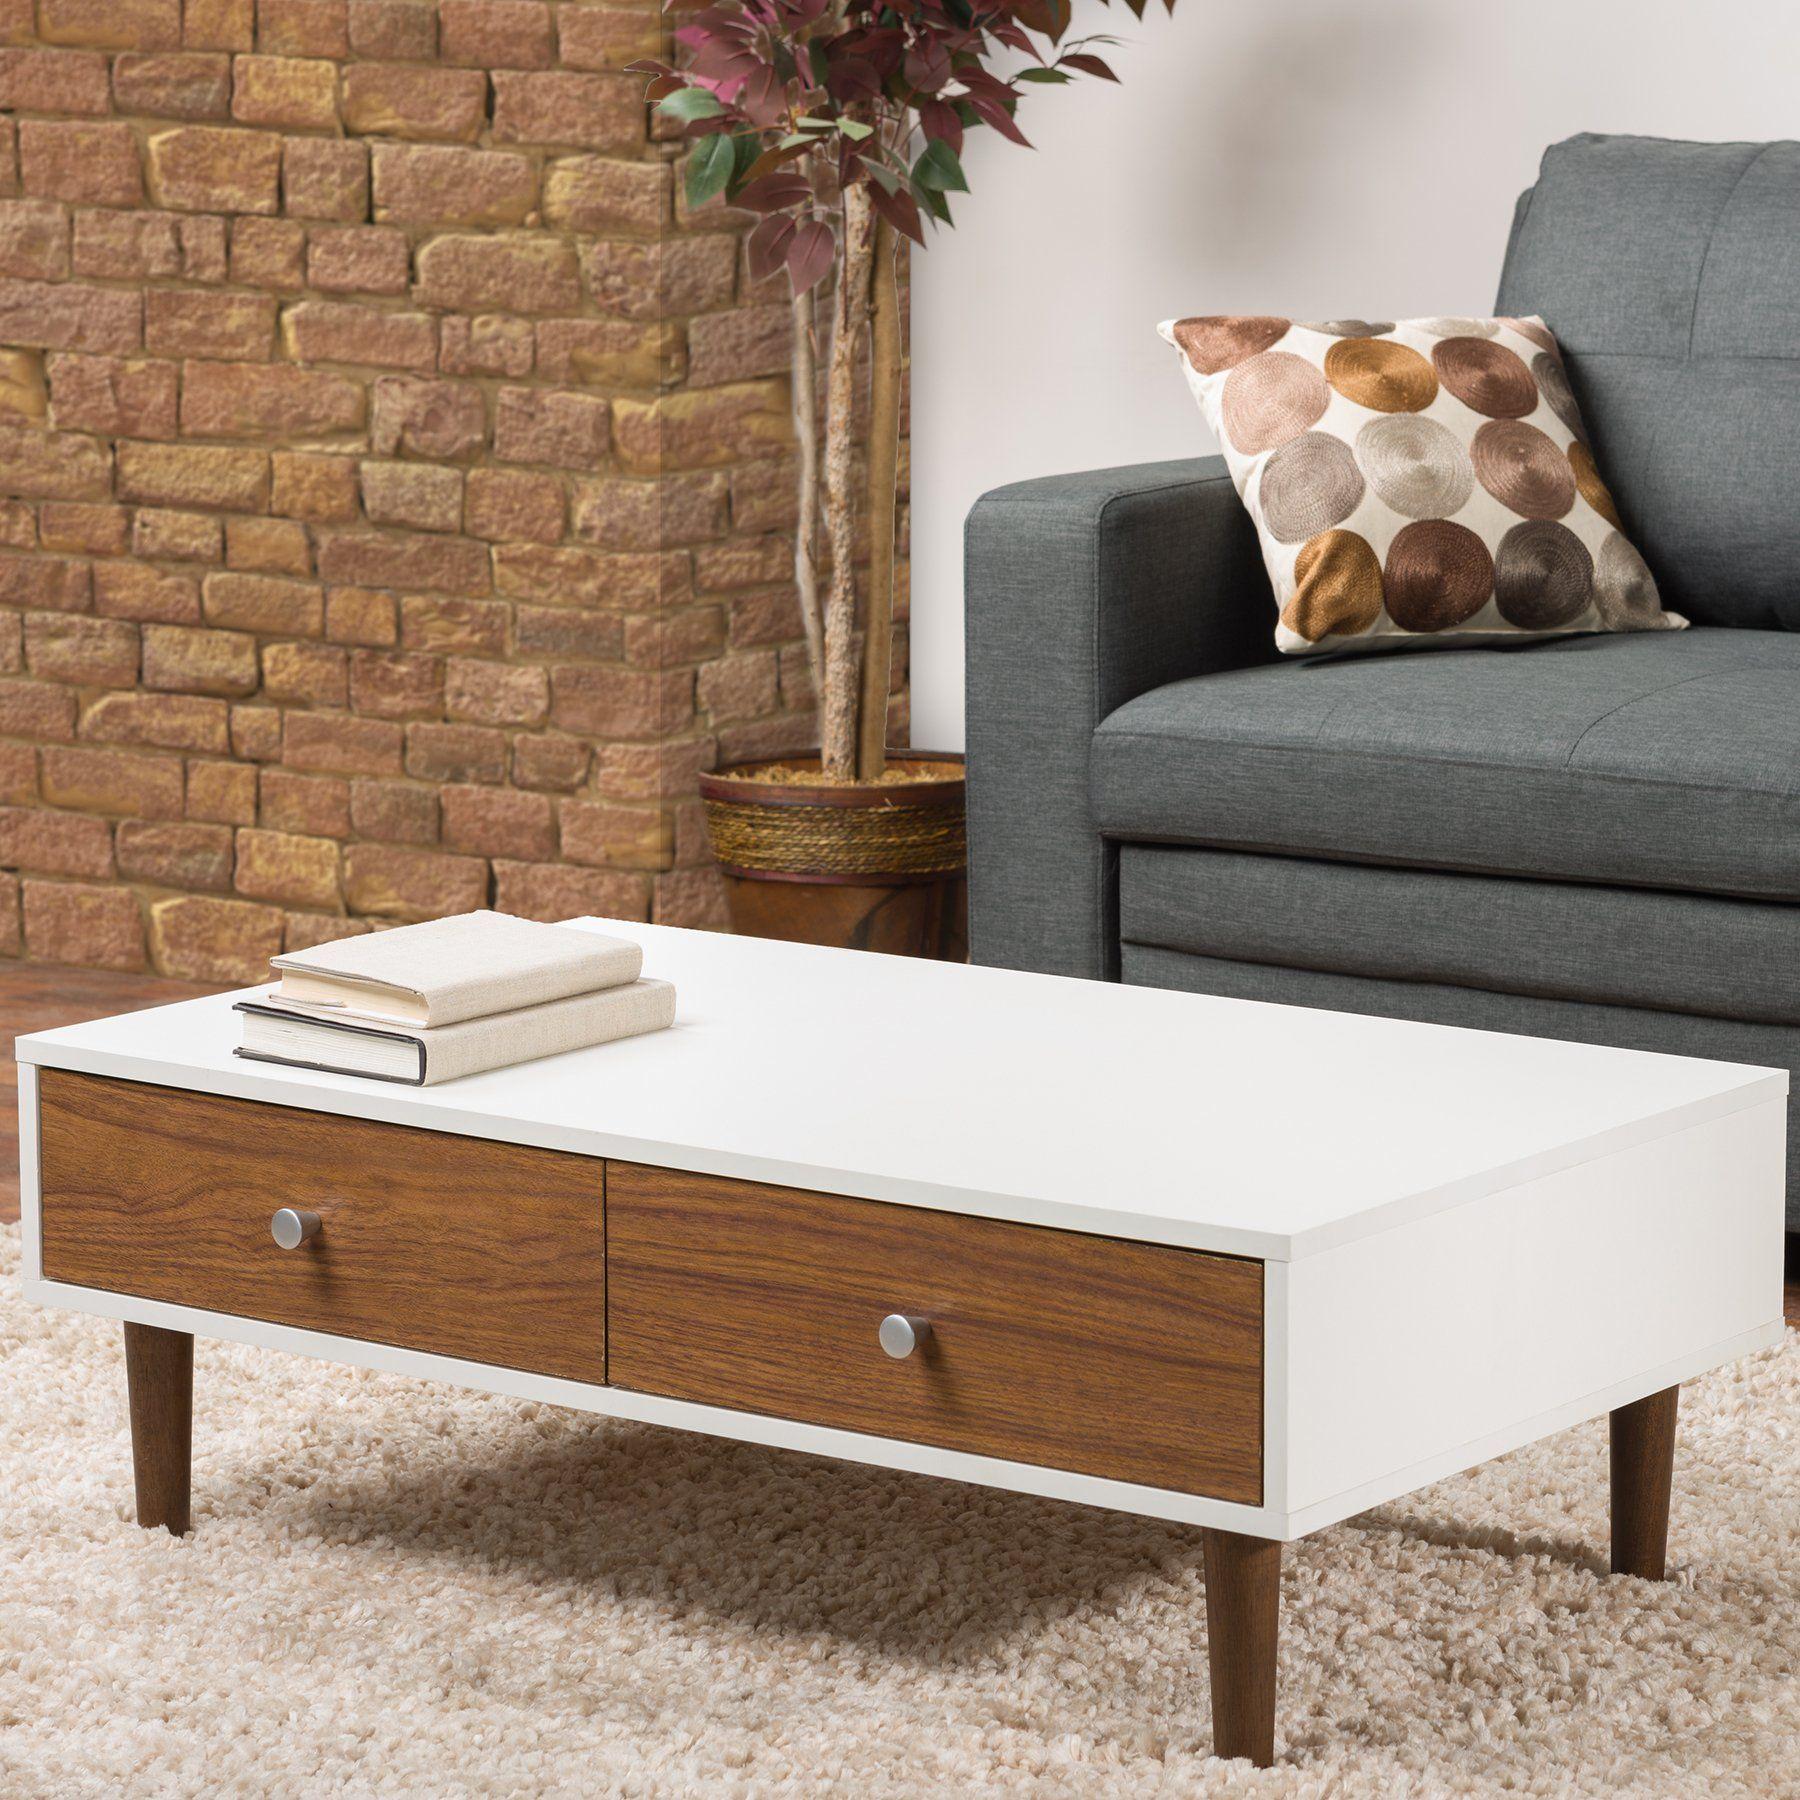 Amazon Living Room Furniture Clearance: $118 + FS (Amazon): Baxton Studio Gemini Wood Contemporary